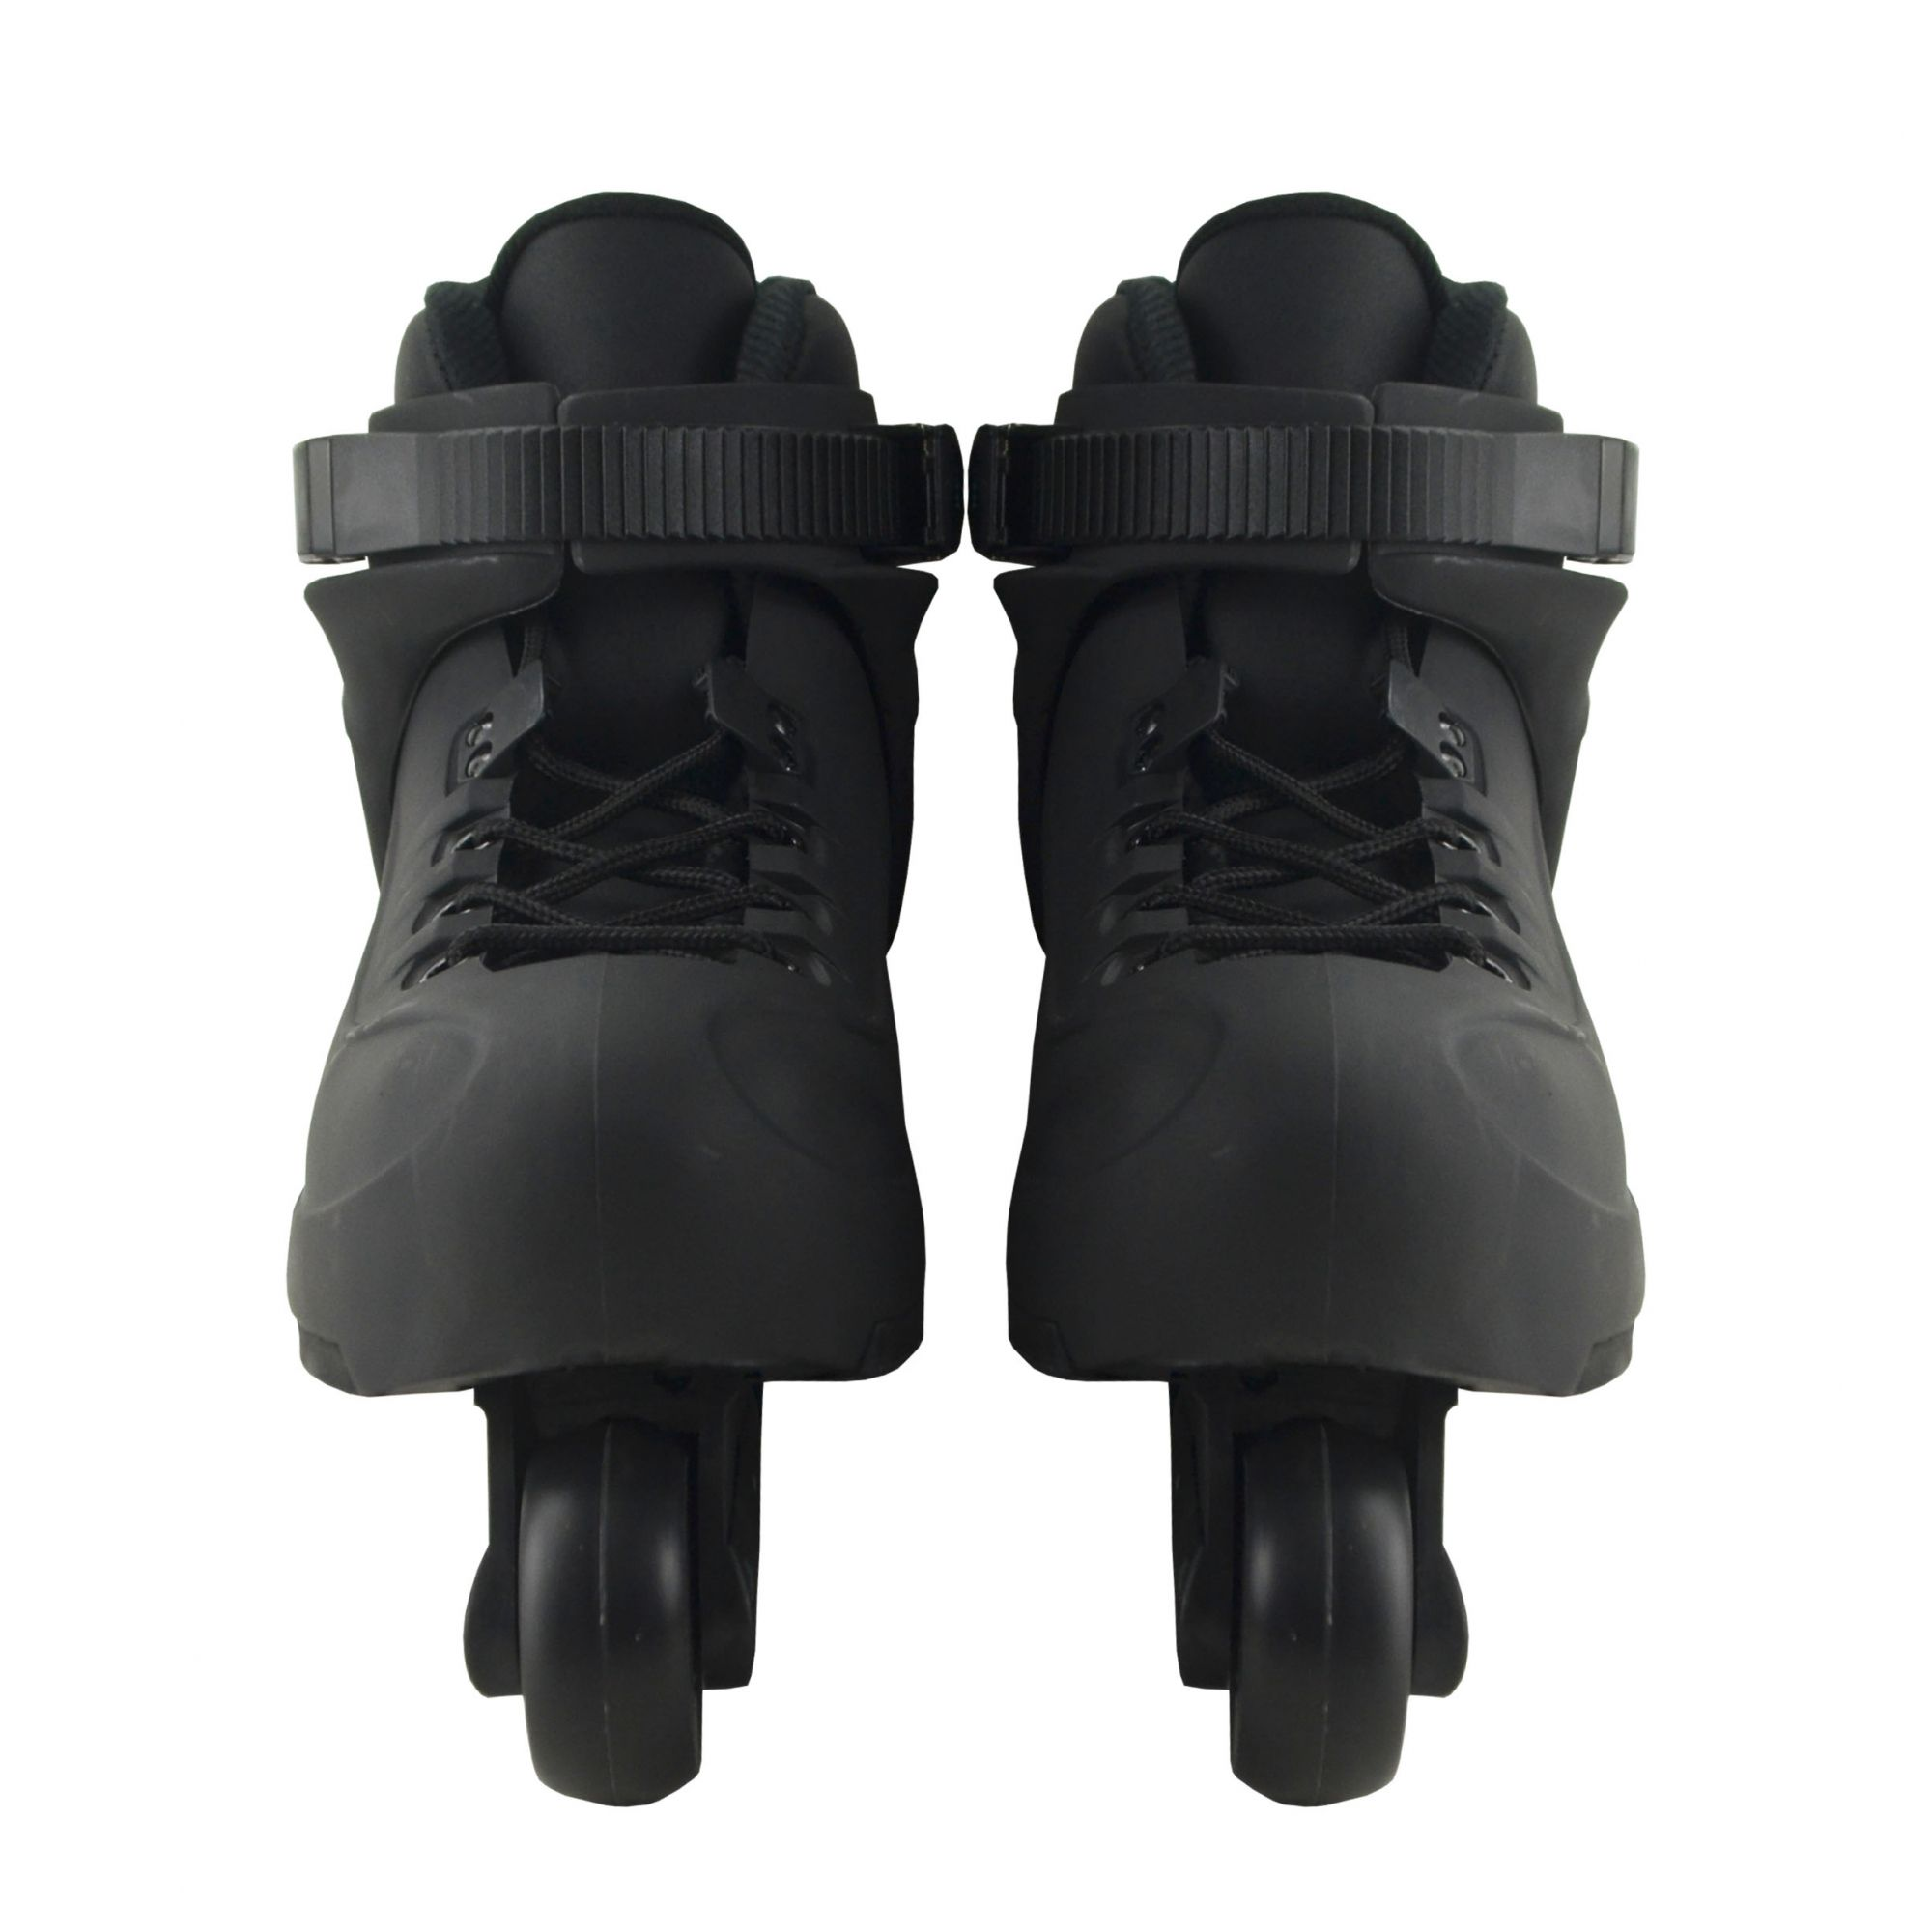 Patins Traxart Black New (Street/Vertical) - Roda 57mm ABEC-7 Cromo